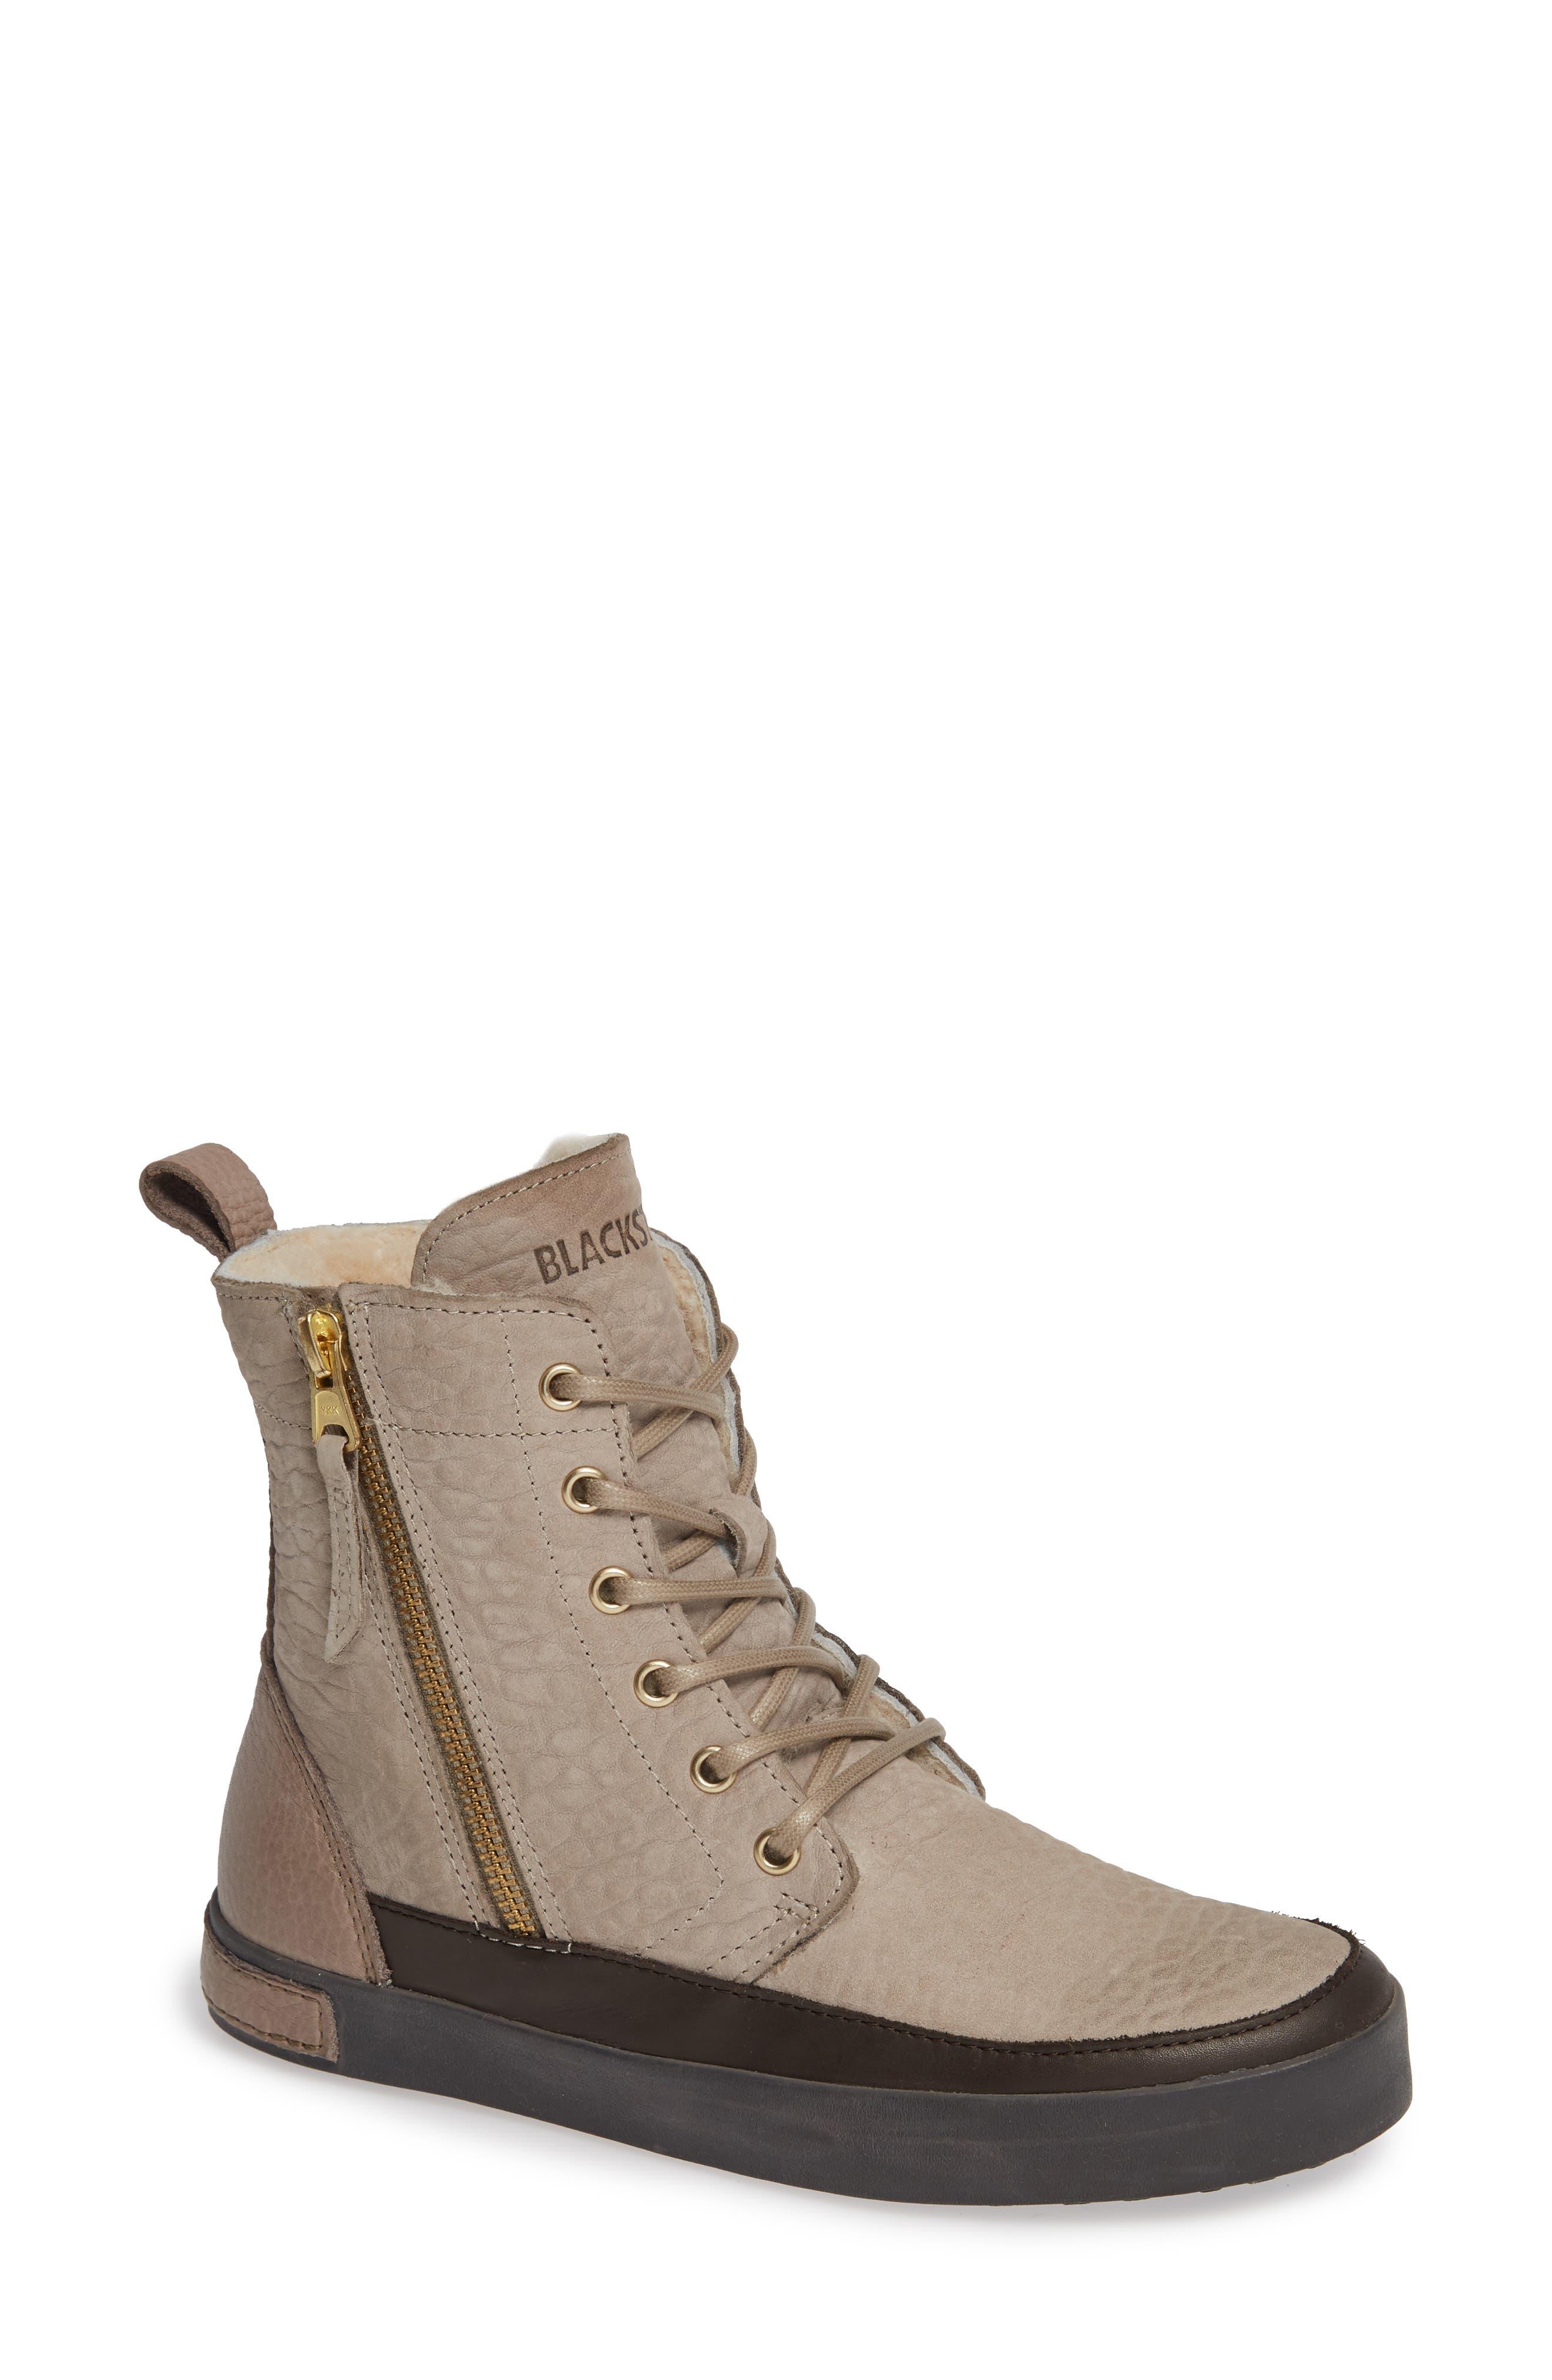 Blackstone Ql43 High Top Sneaker With Genuine Shearling Lining, Grey